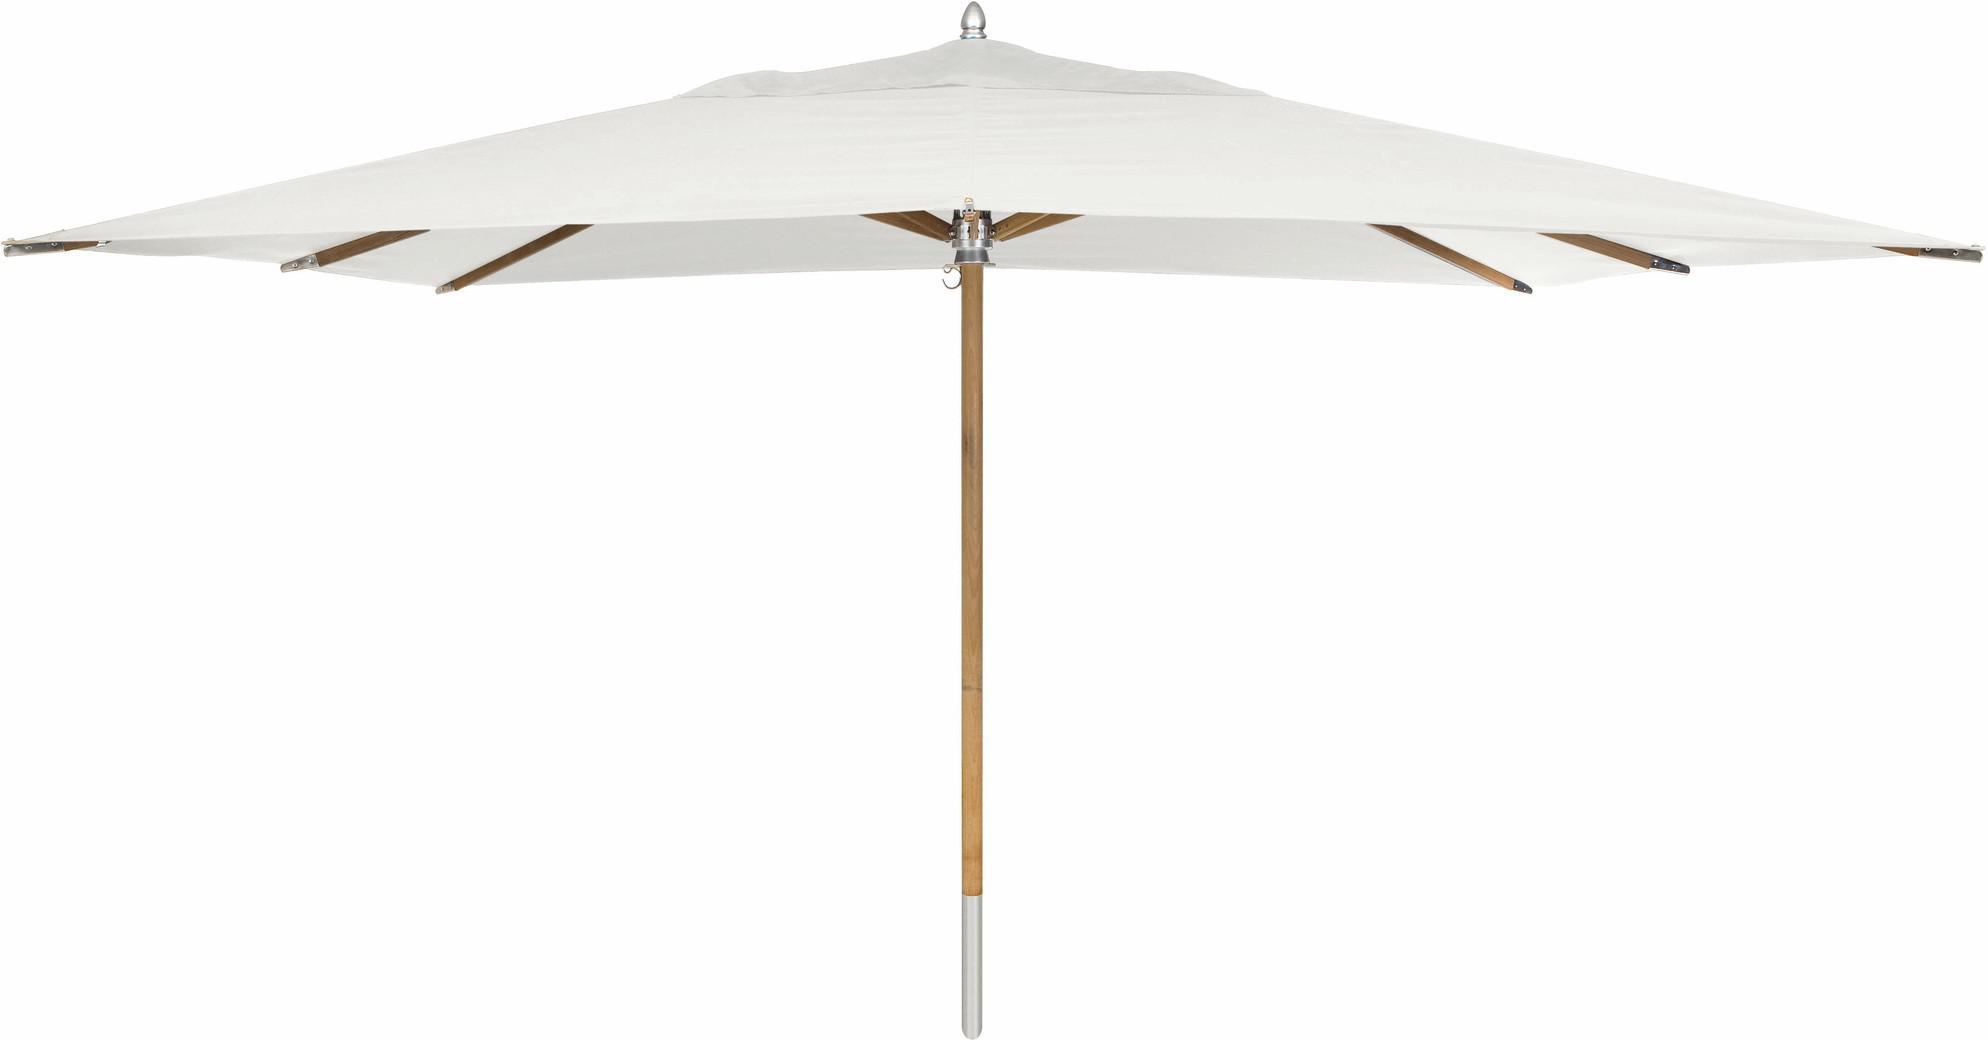 Umbrella central pole teak 300x400 canvas